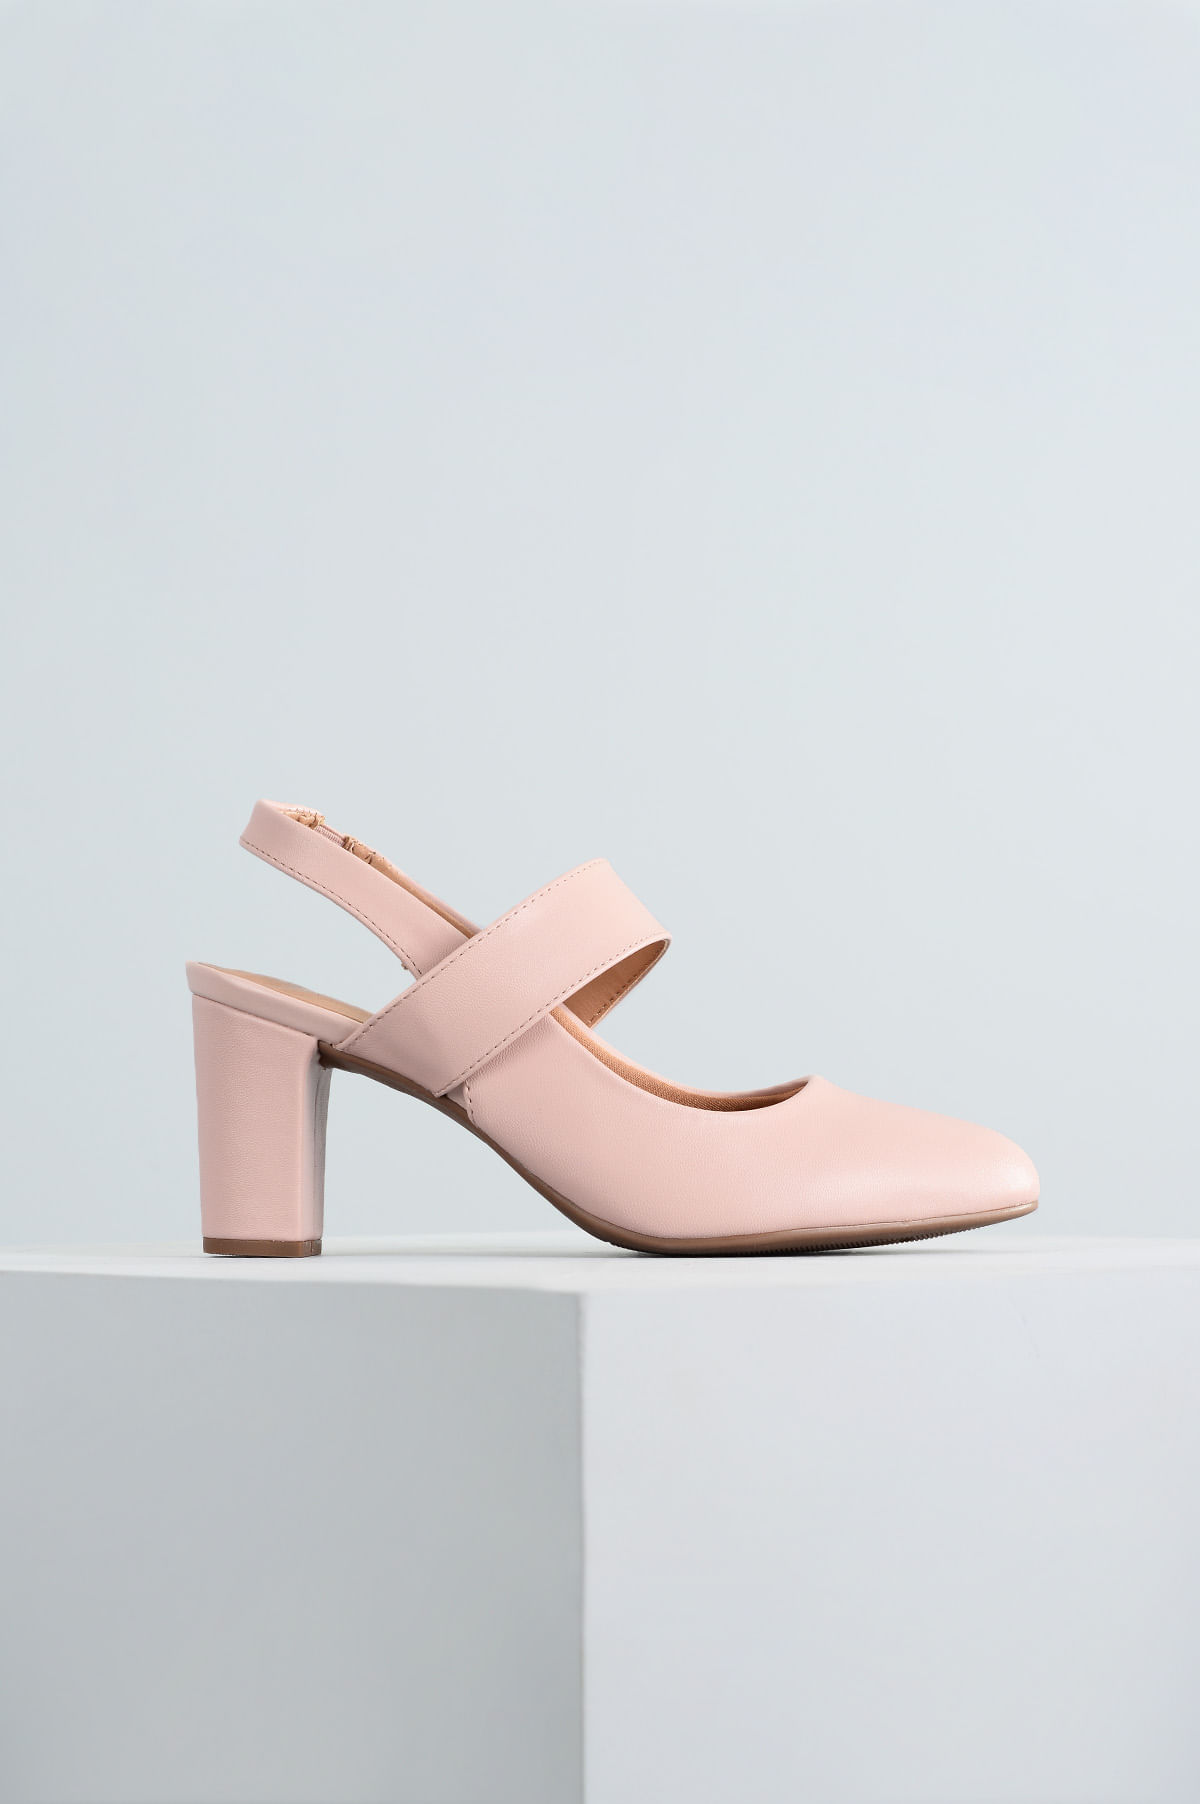 607ad8af9 Sapato Salto Alto Heleny Vizzano SINT - ROSA - Mundial Calçados